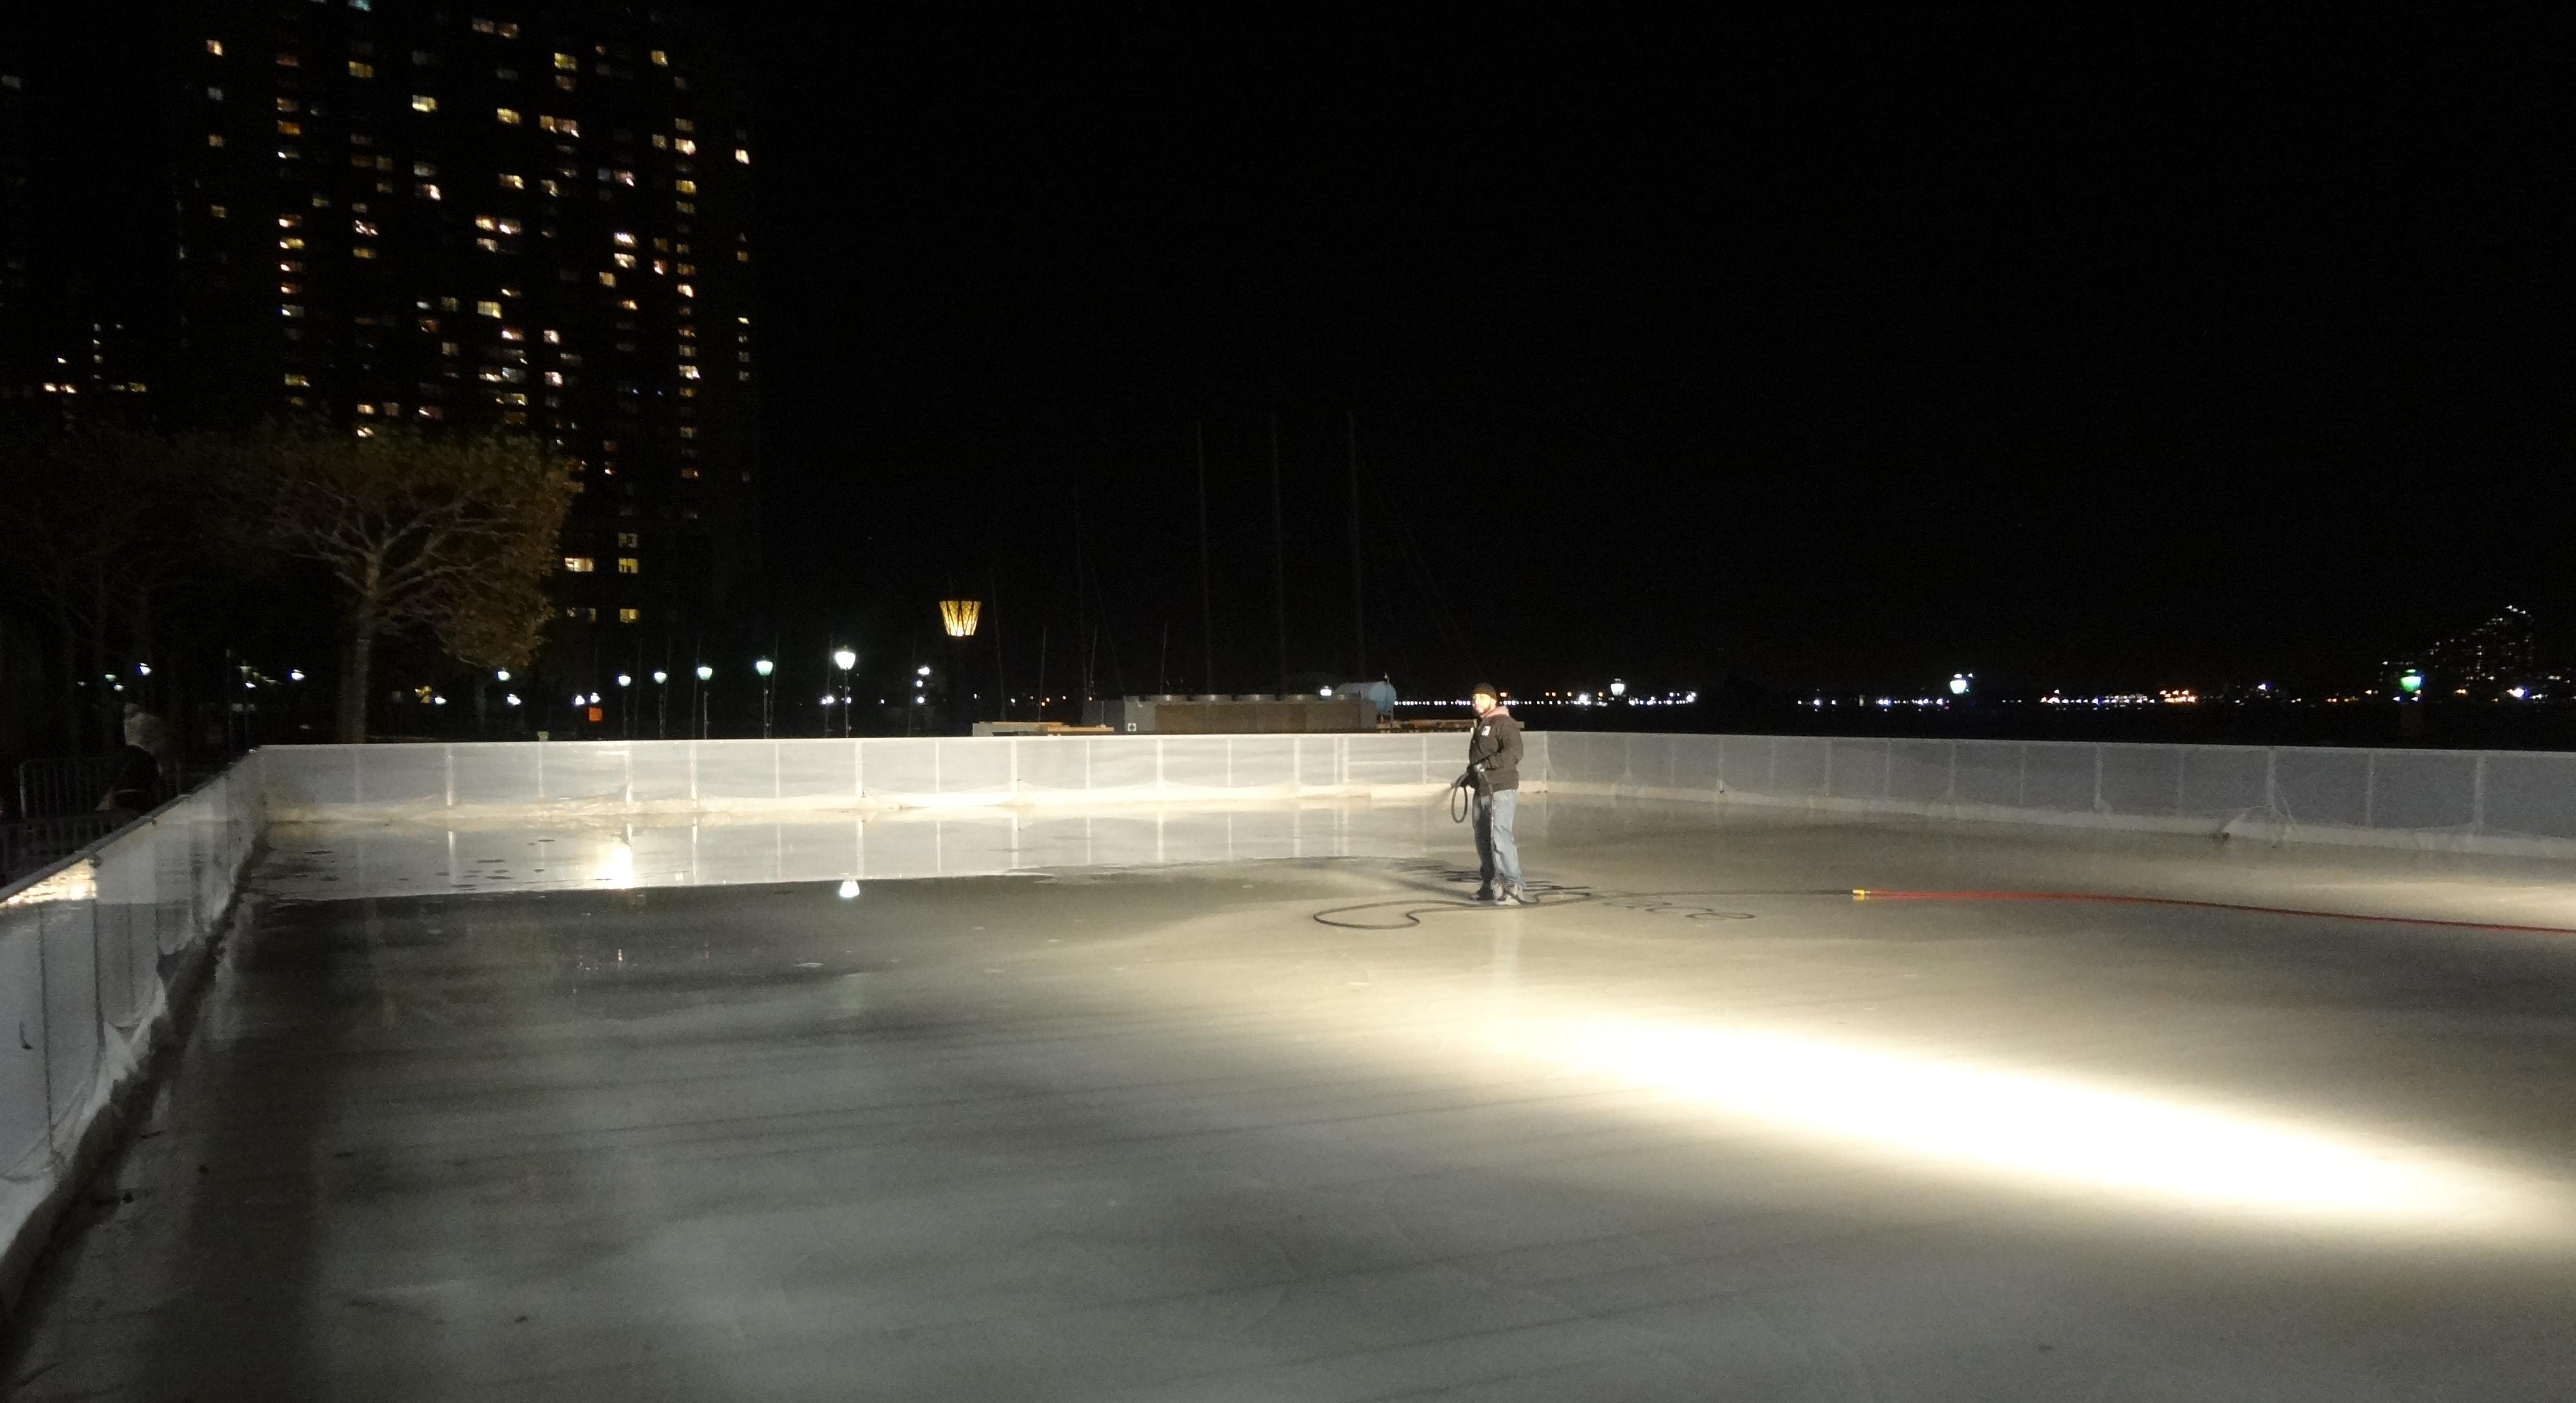 Ice rink 11-13-2013